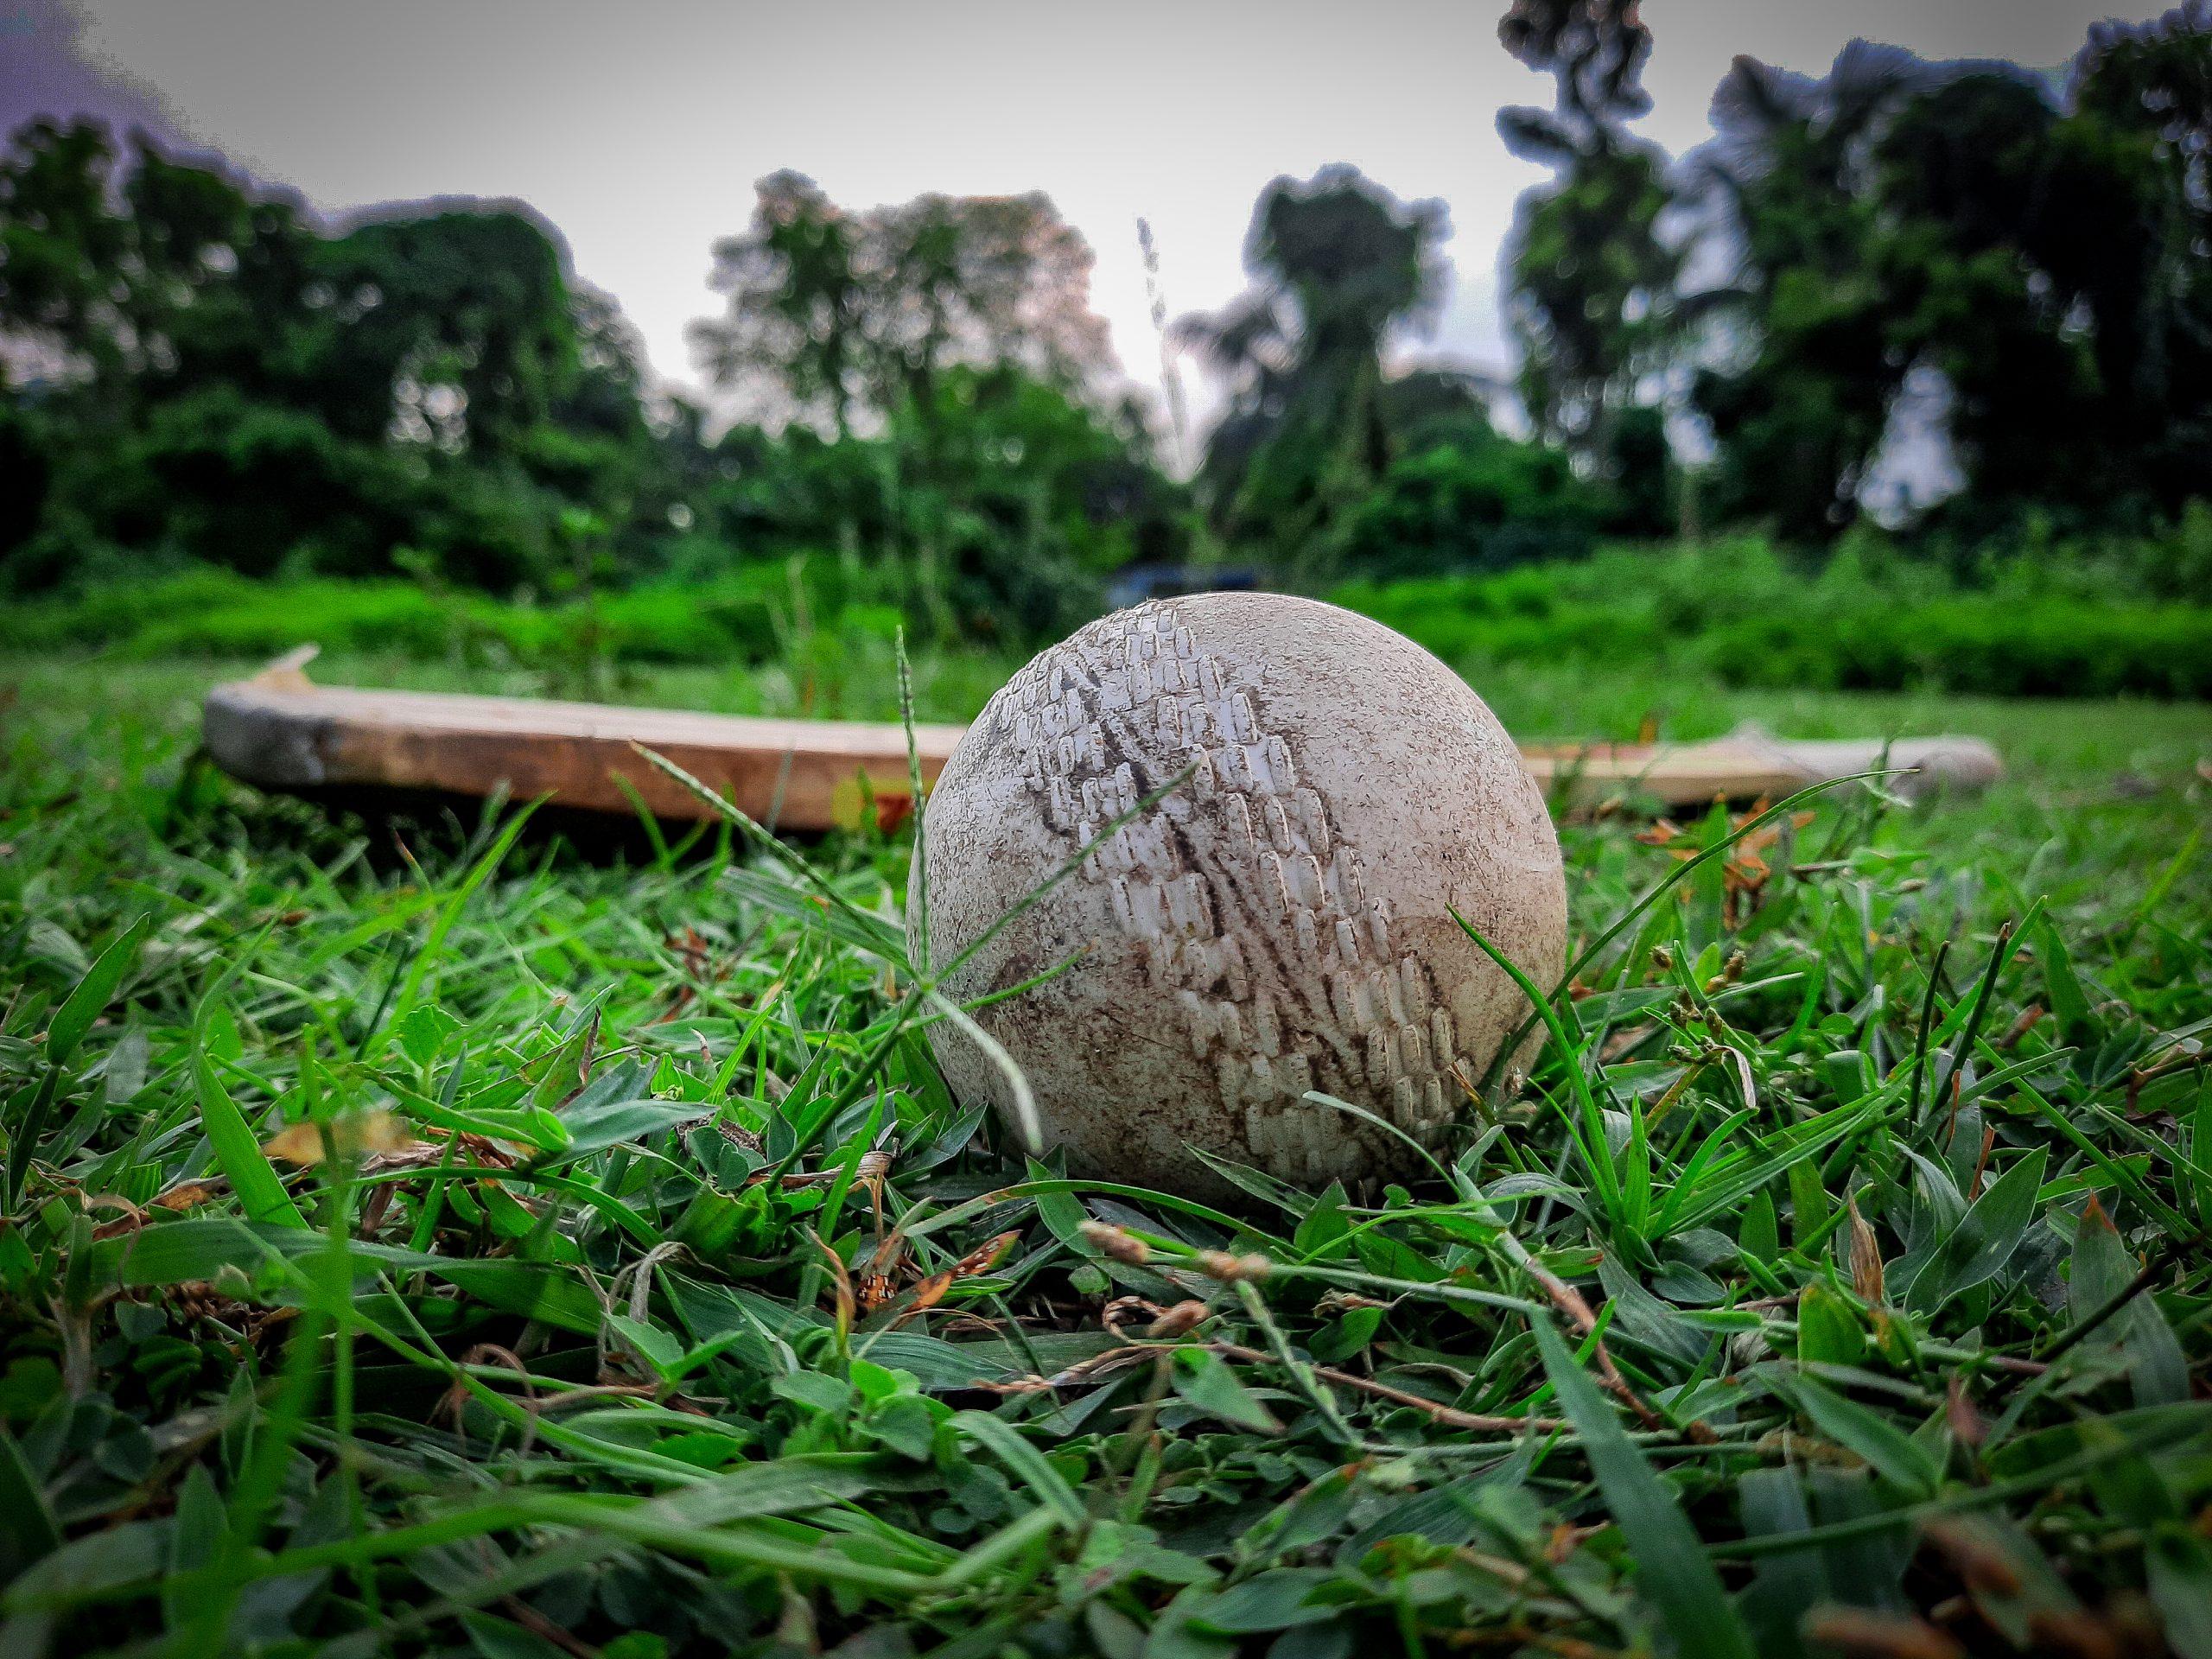 Cricket ball and bat on grass